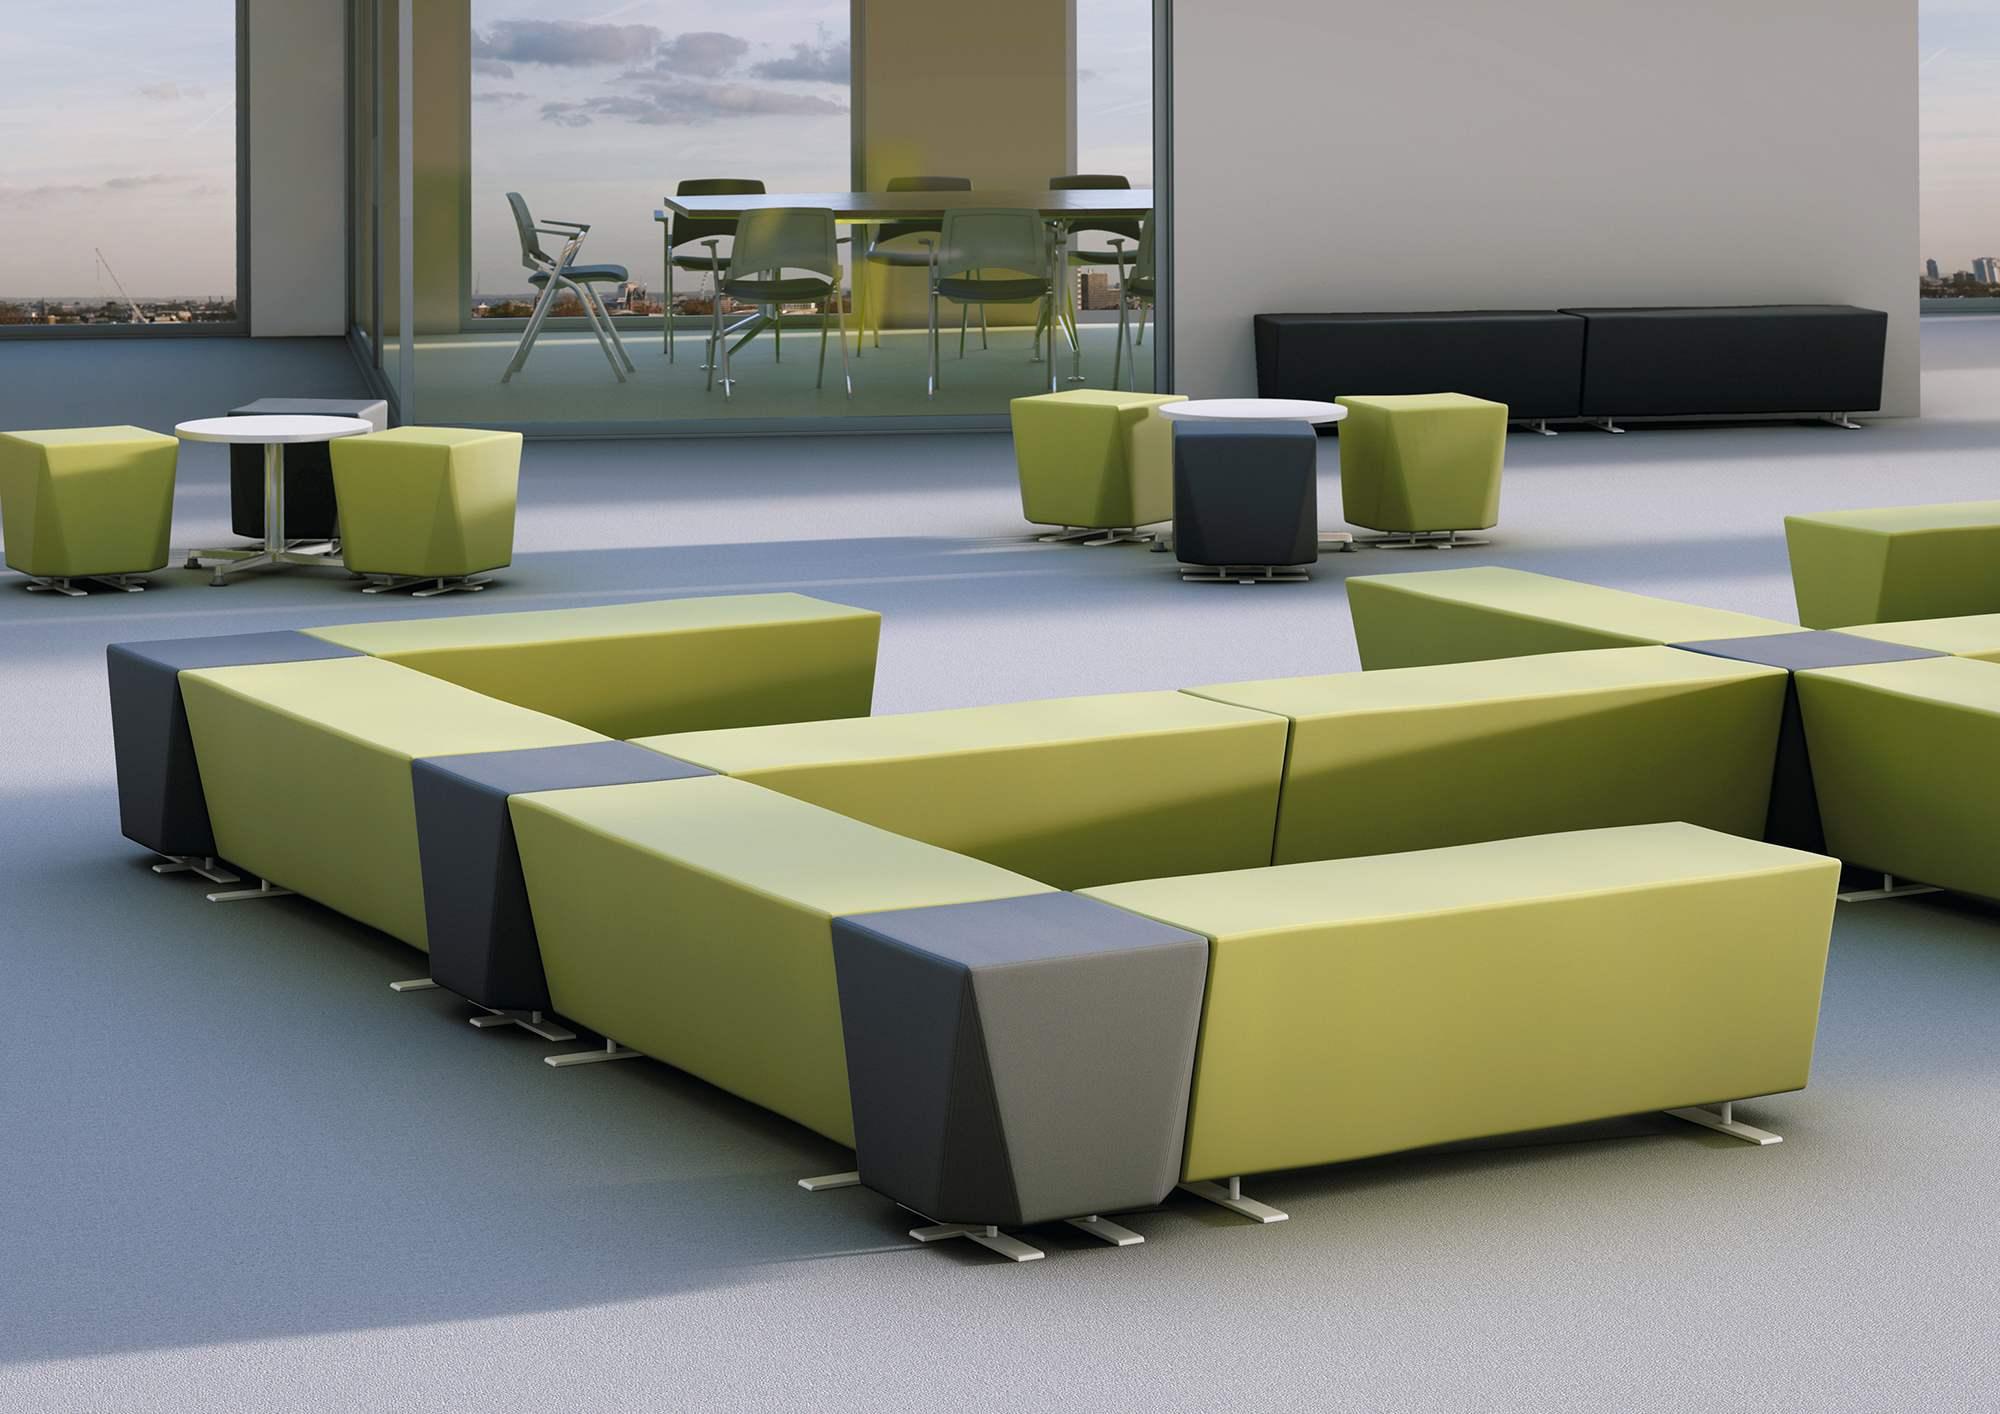 32 bespoke office furniture birmingham bespoke for K furniture birmingham